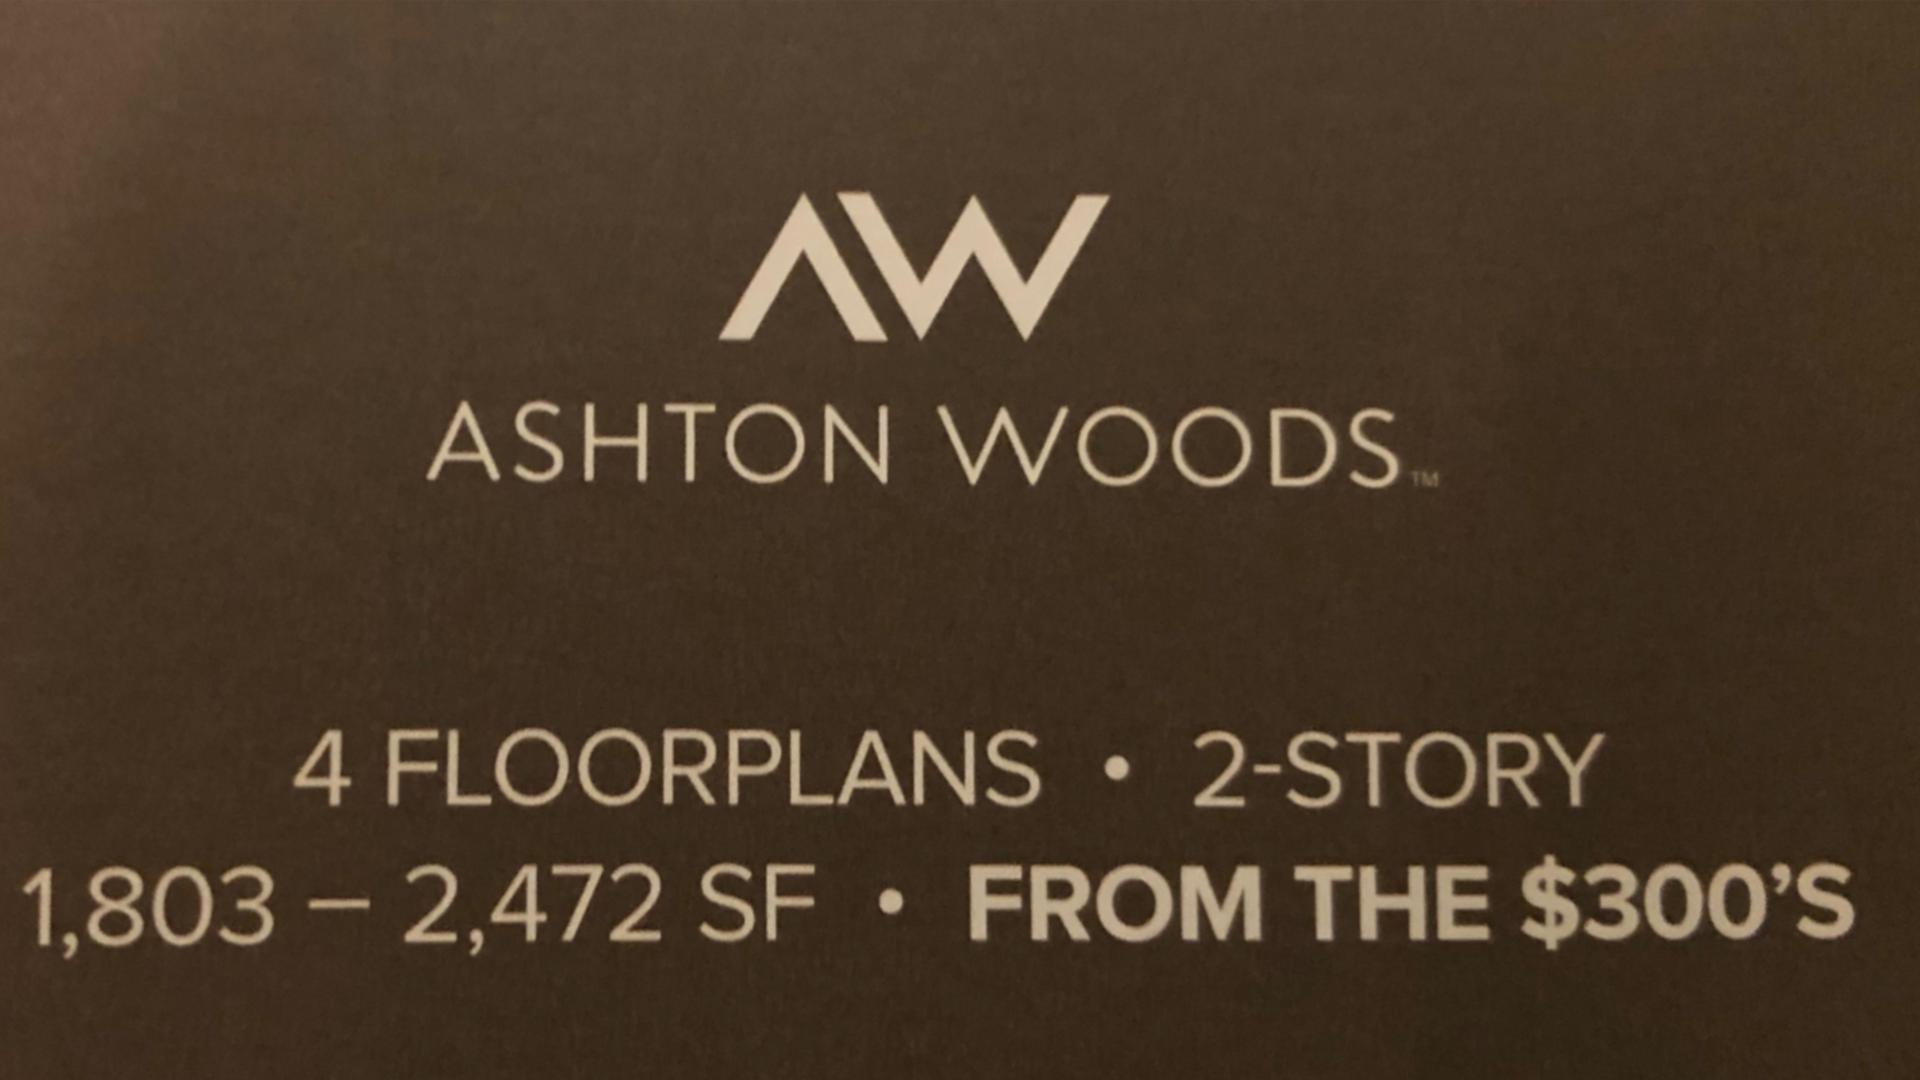 Ashton Woods homes for sale at Union Park Norterra